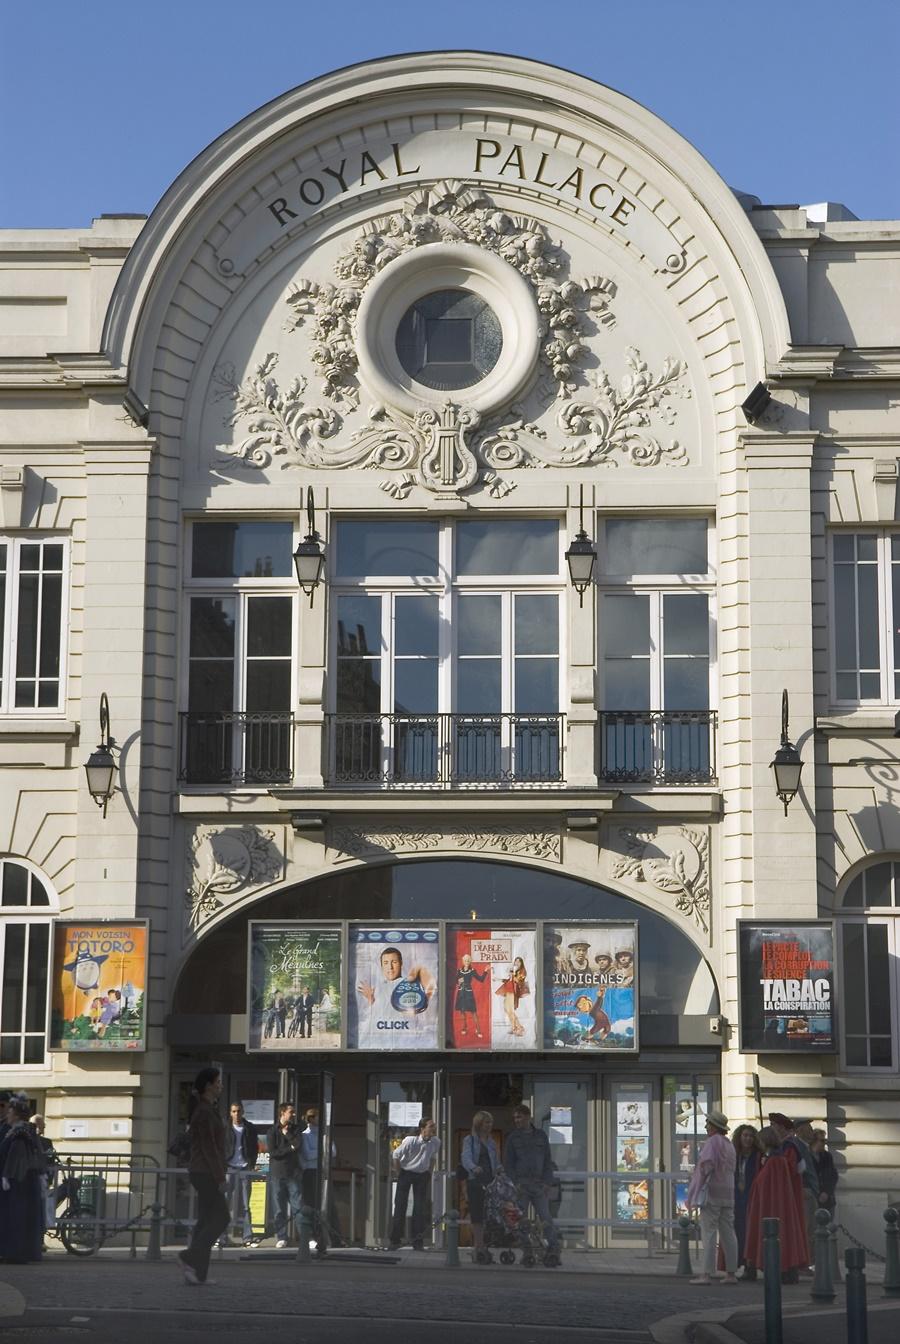 Cinema-royal-palace-4